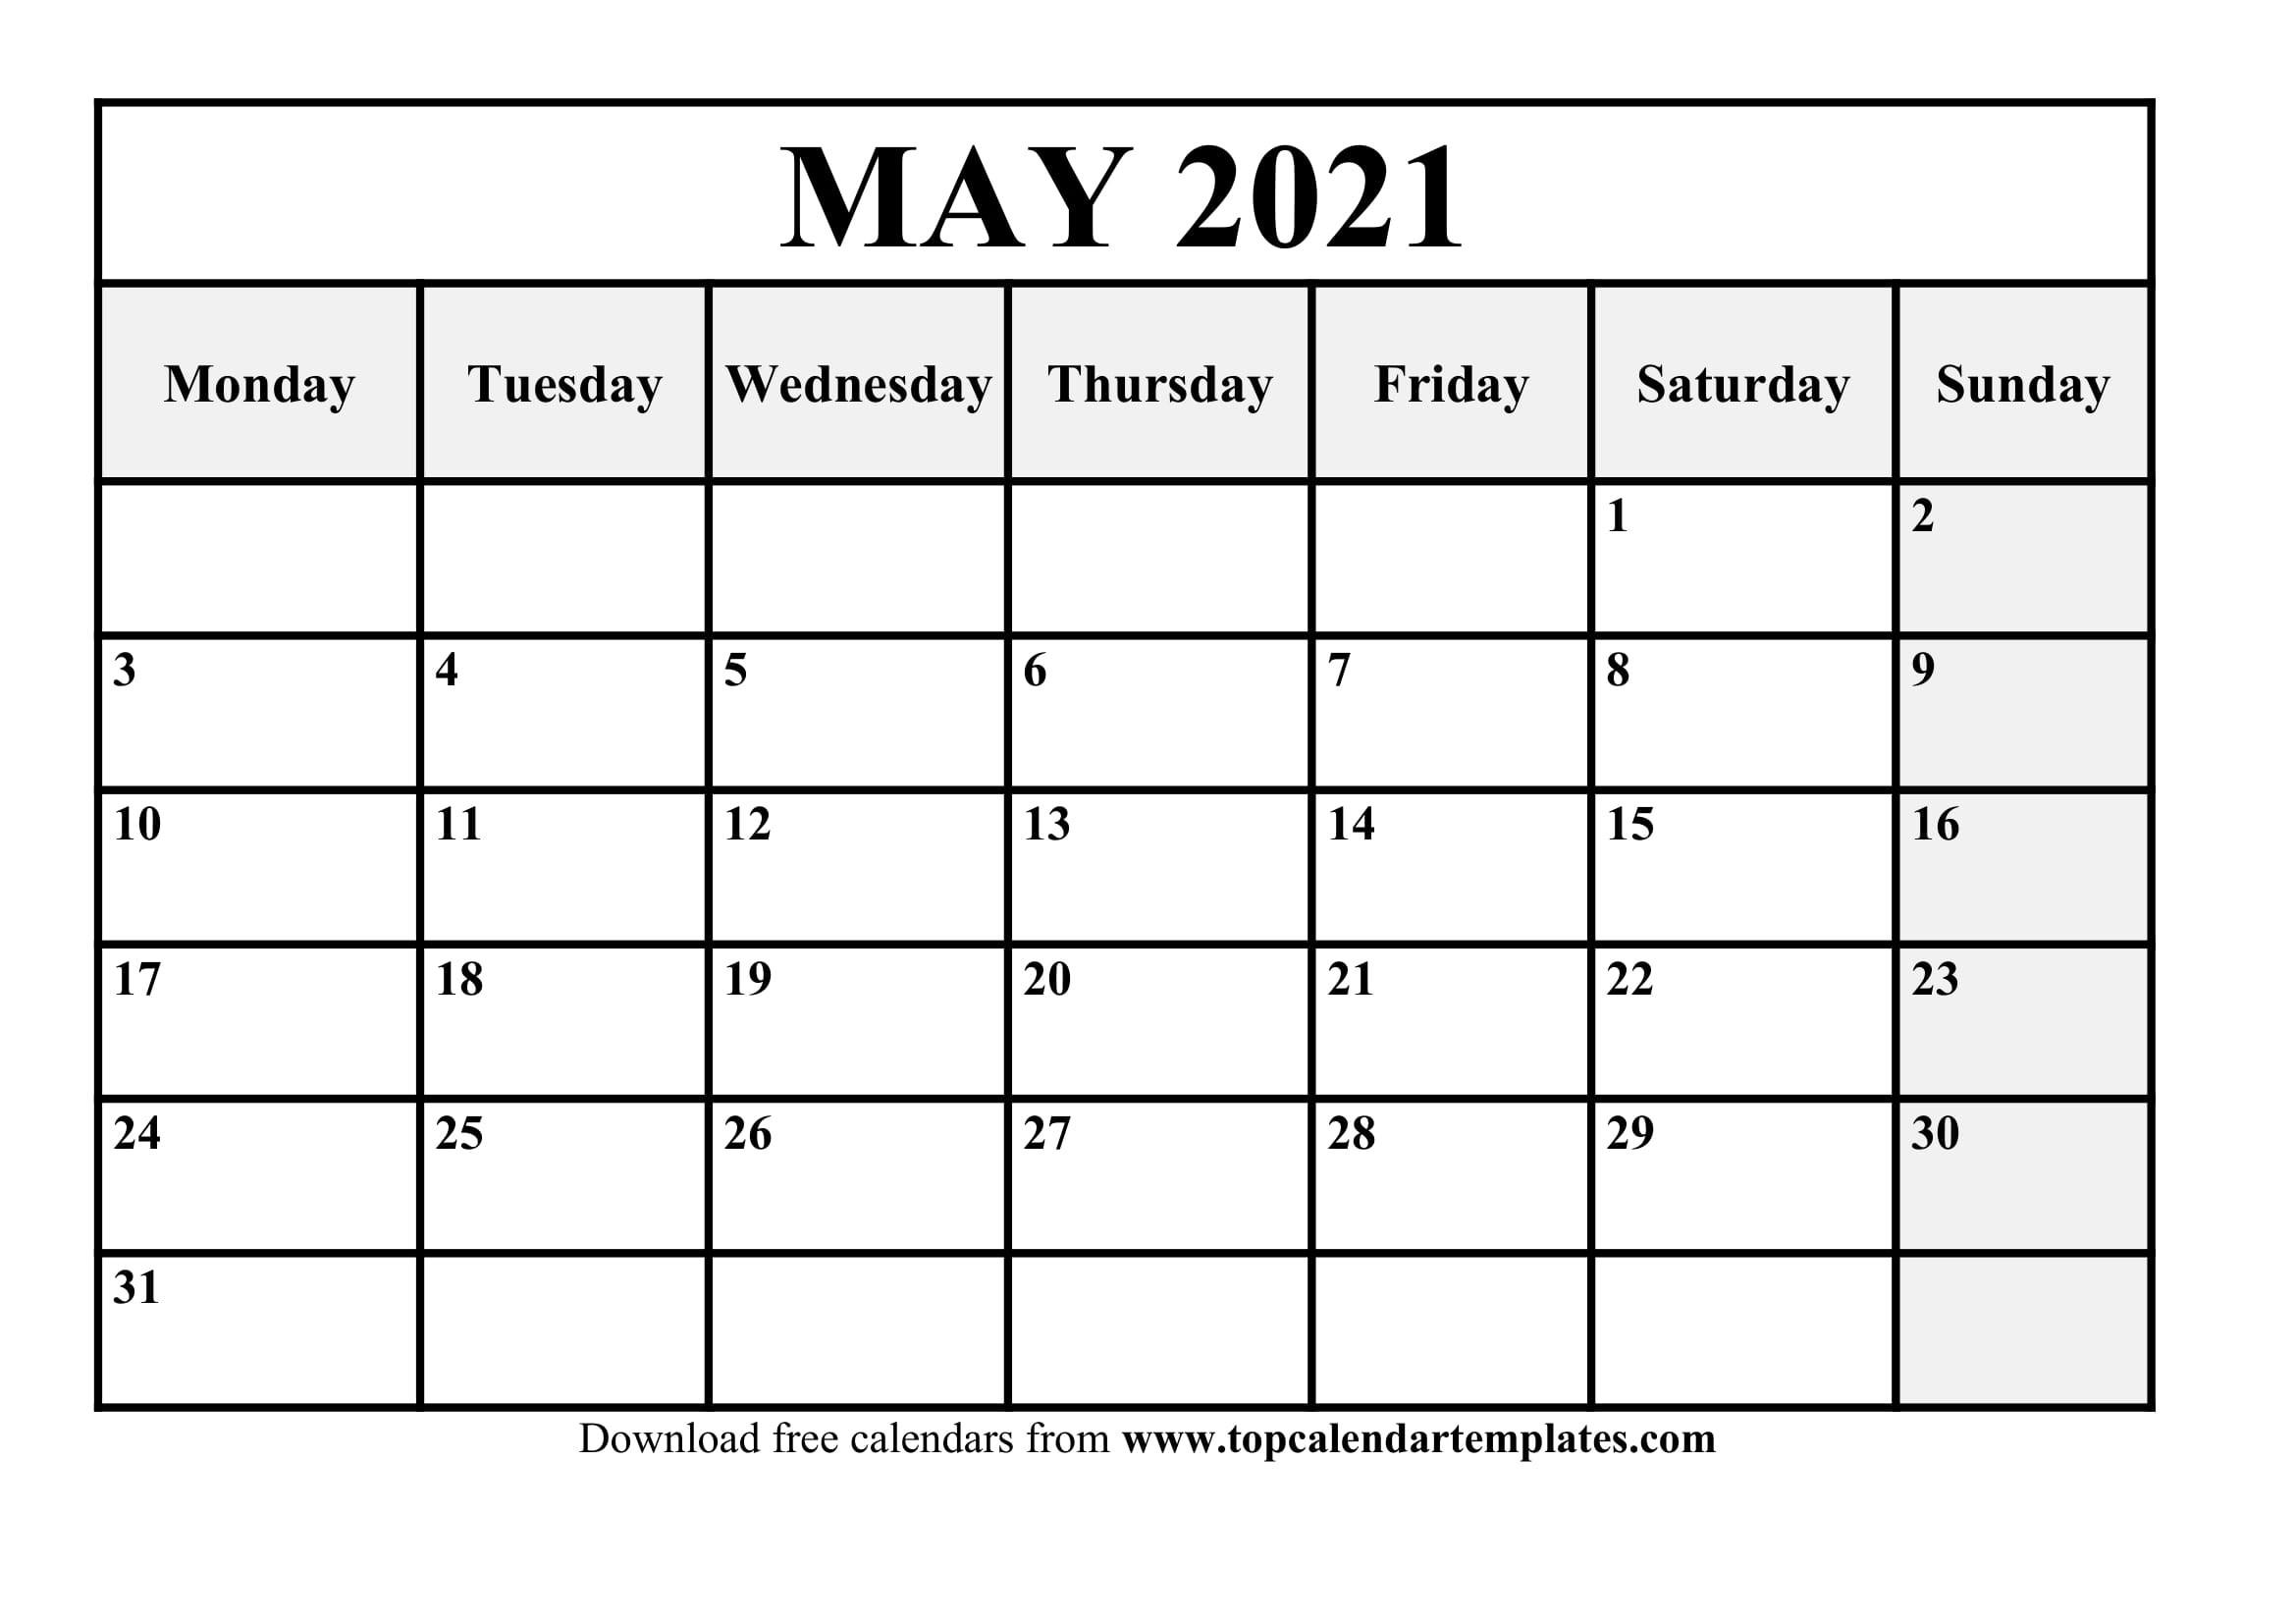 Free May 2021 Printable Calendar In Editable Format  Editable Monthly Calendar Printable